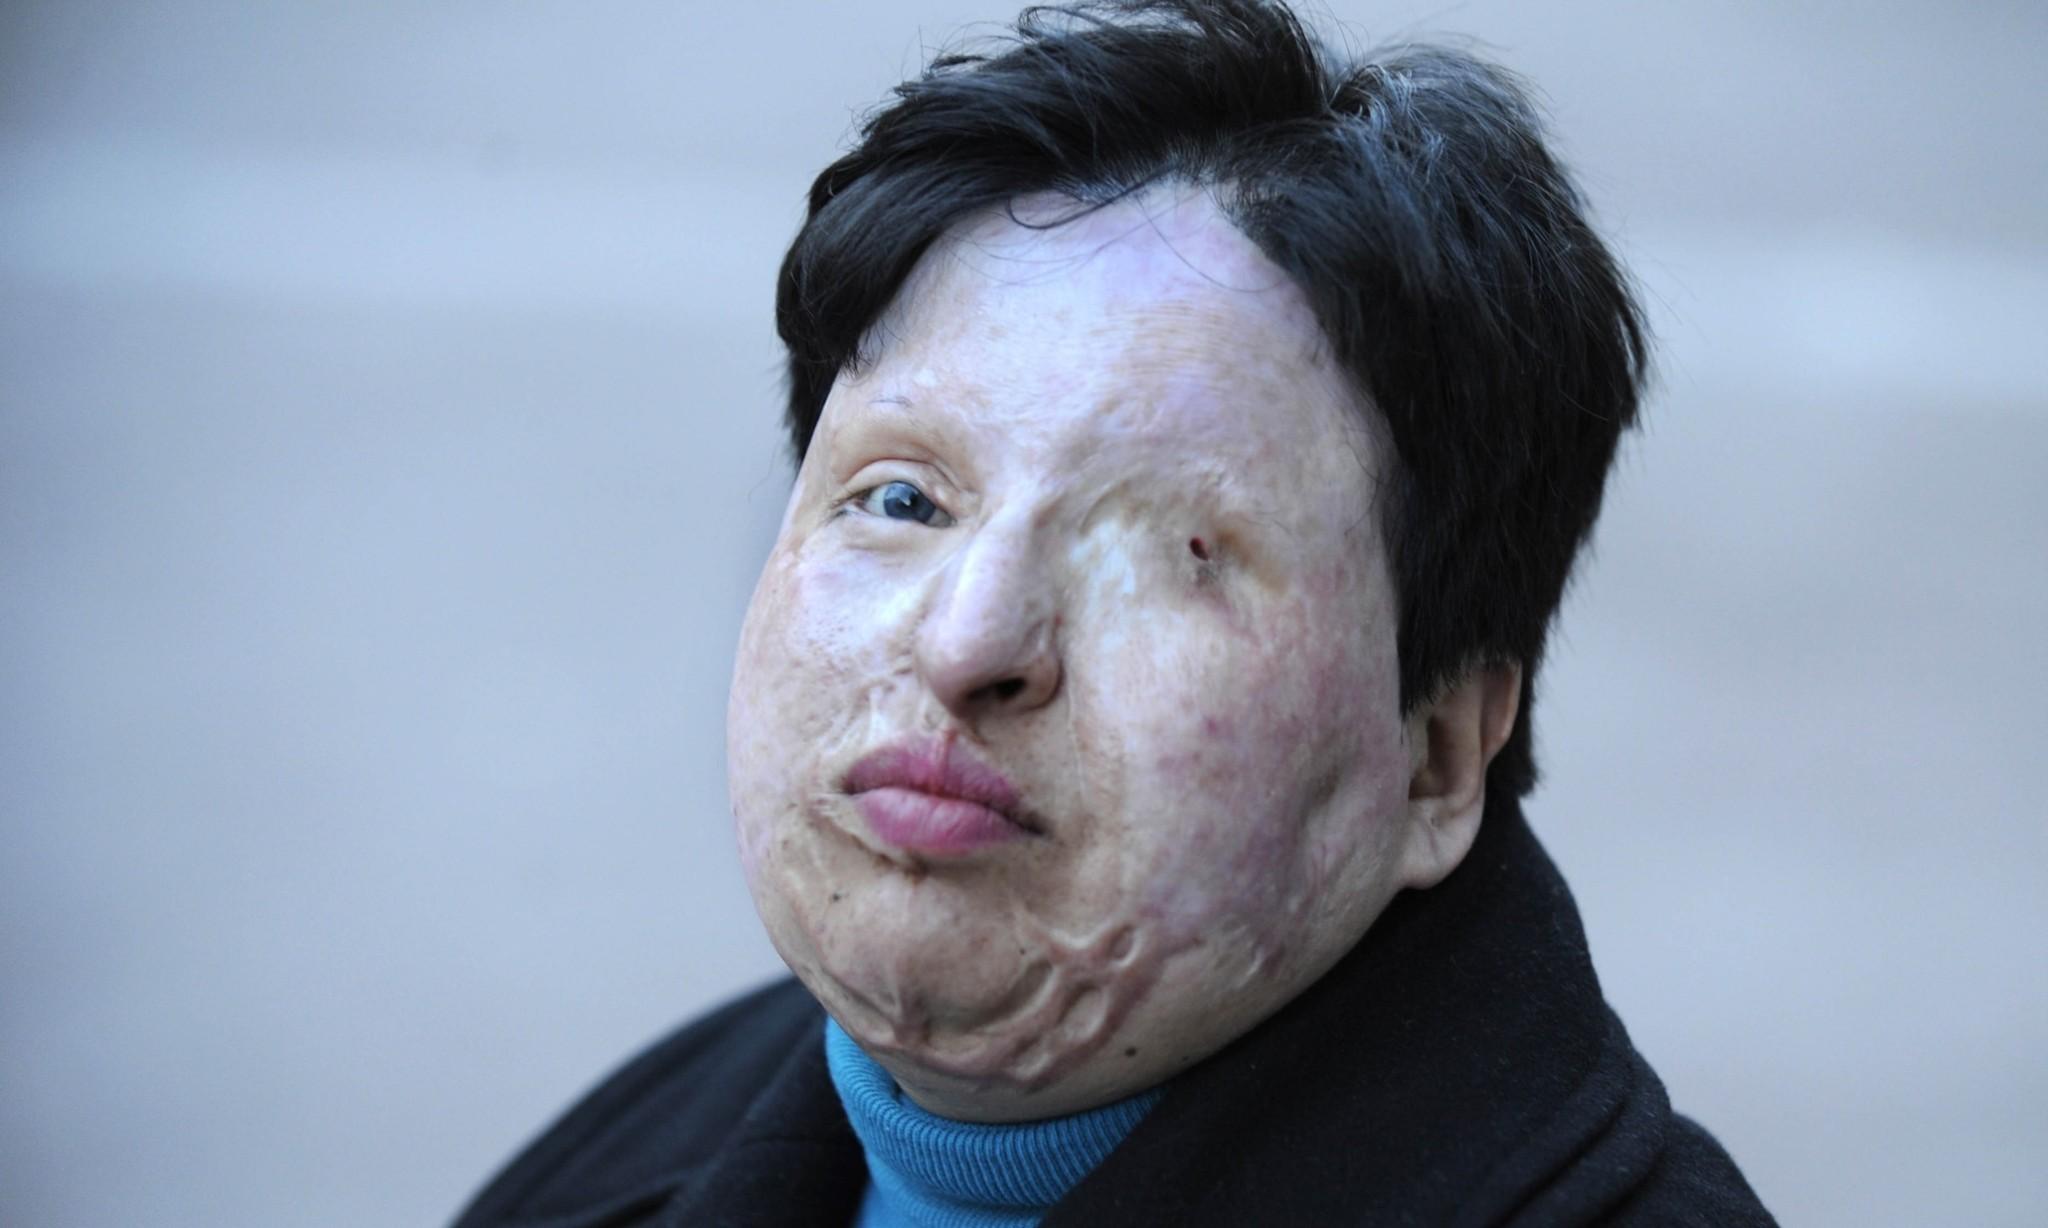 Eye for an eye: Iran blinds acid attacker